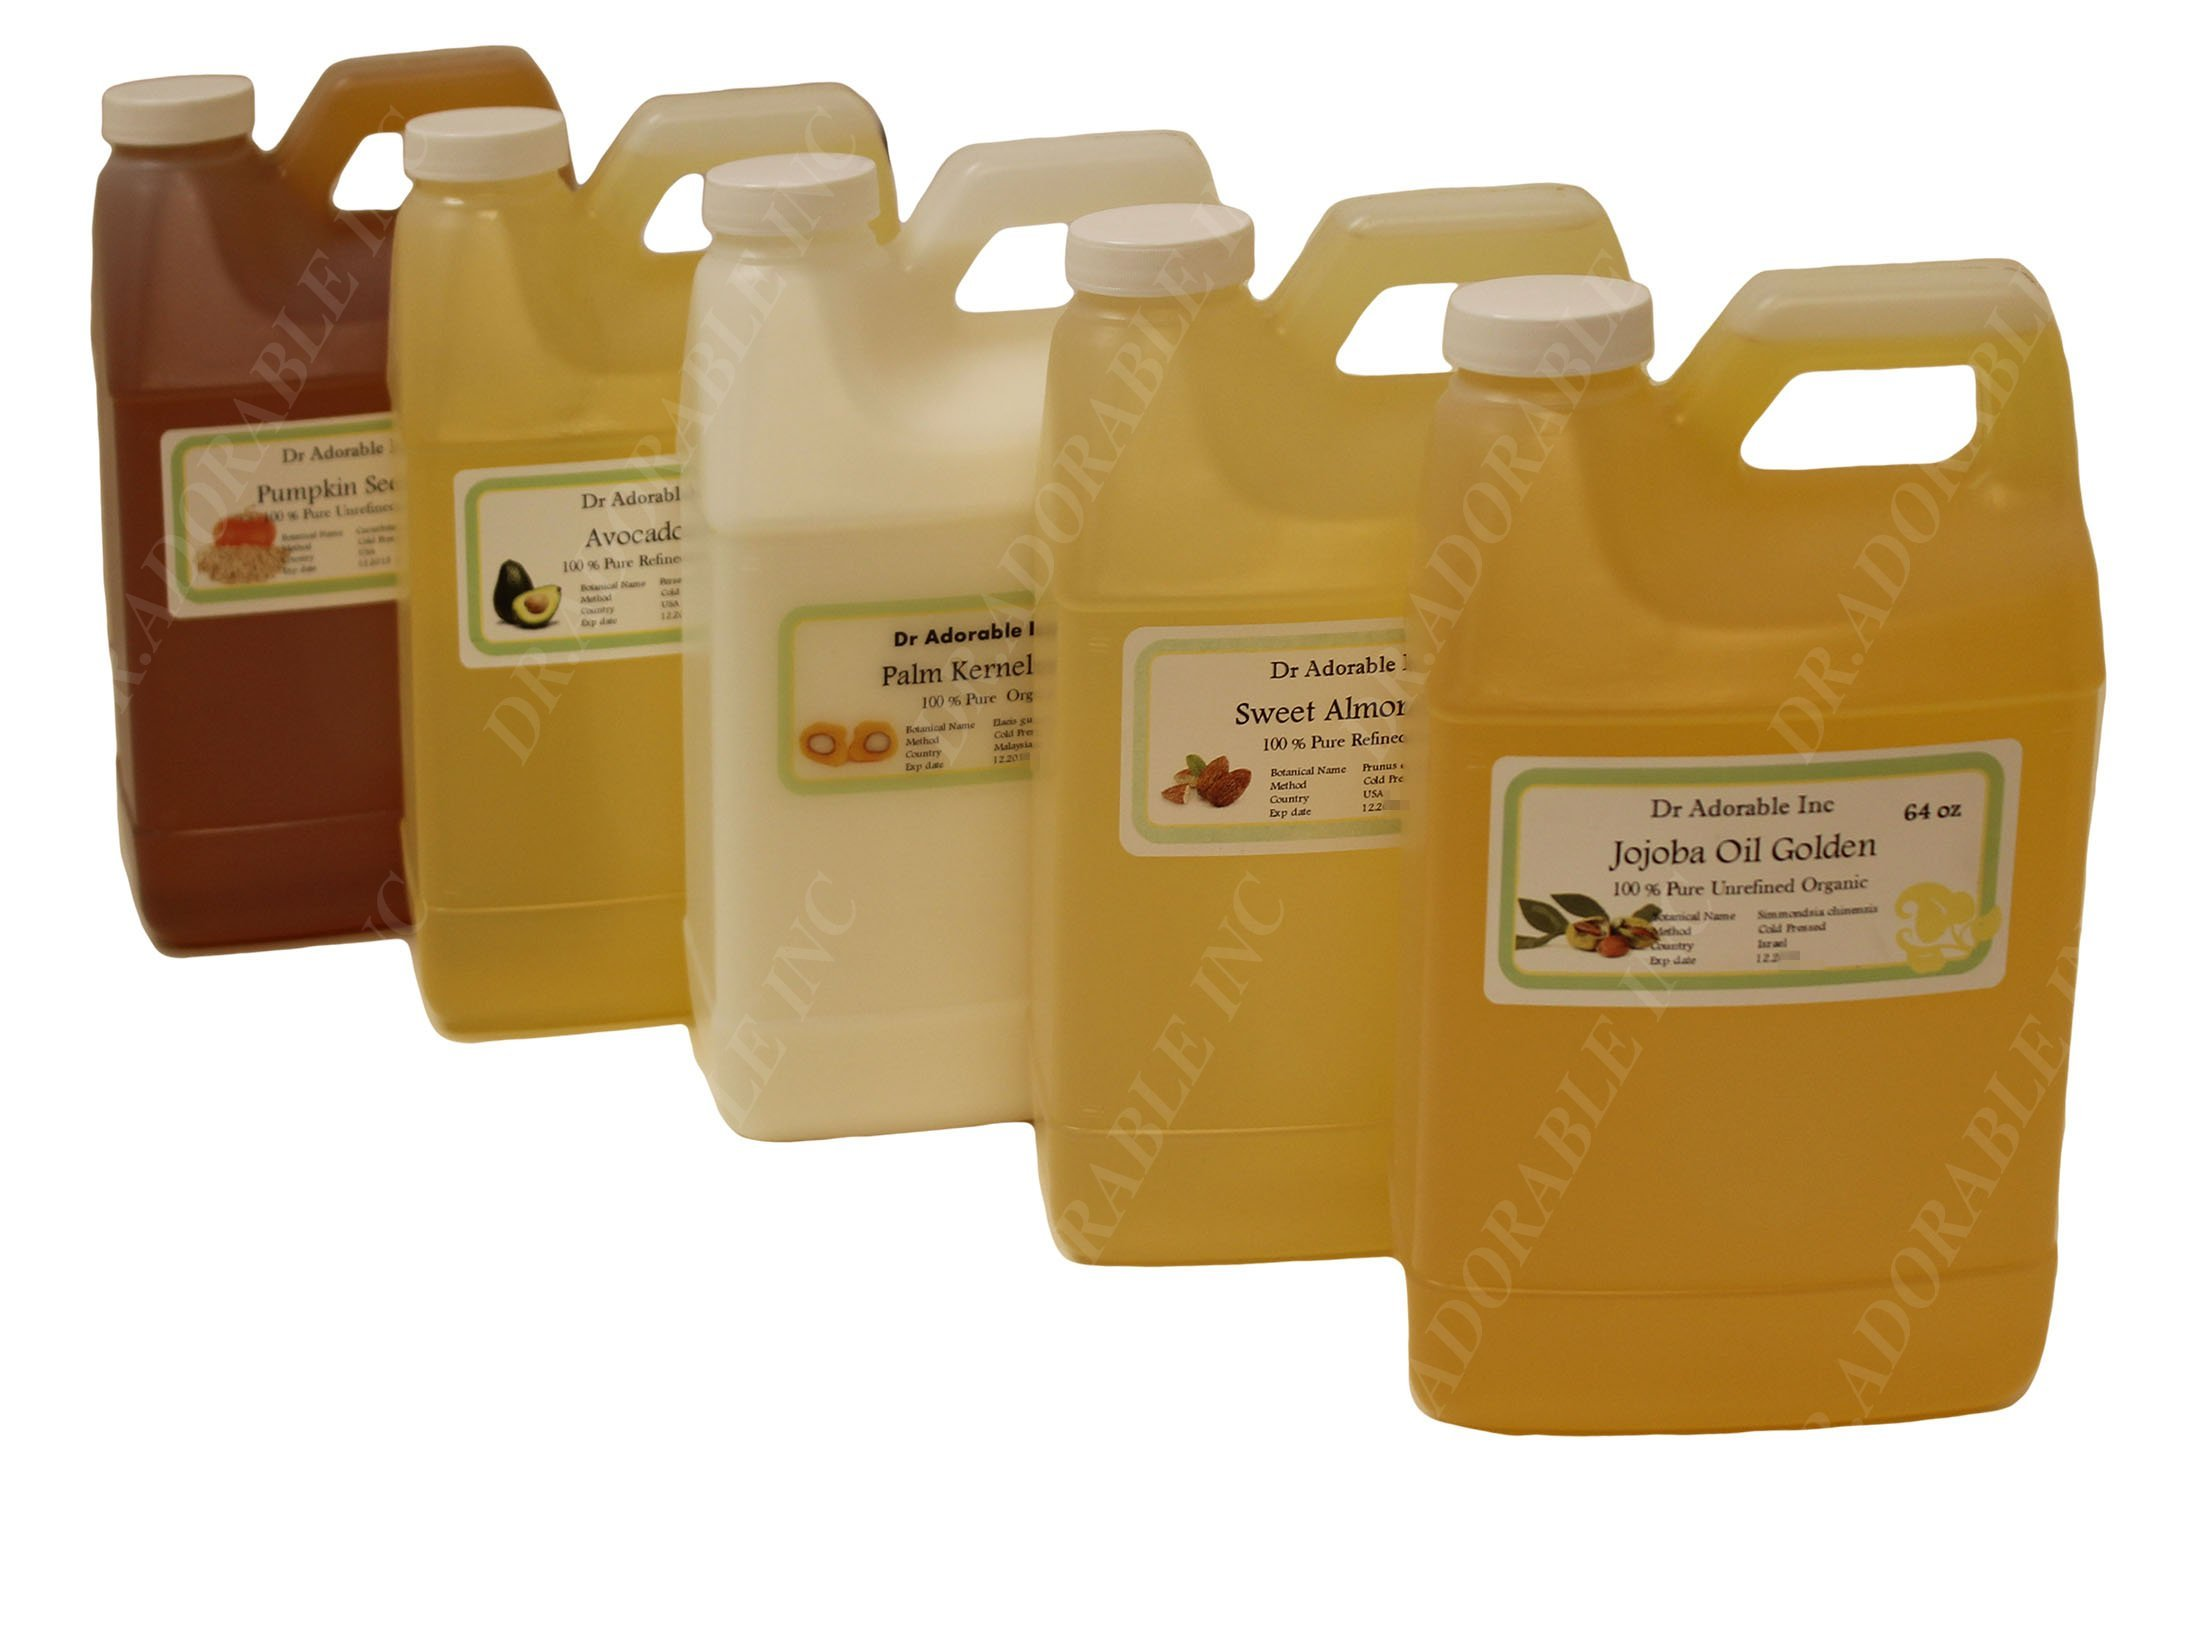 Peanut Oil Unrefined Organic 100 % Pure 64 Oz / 2 Quarters by Dr Adorable